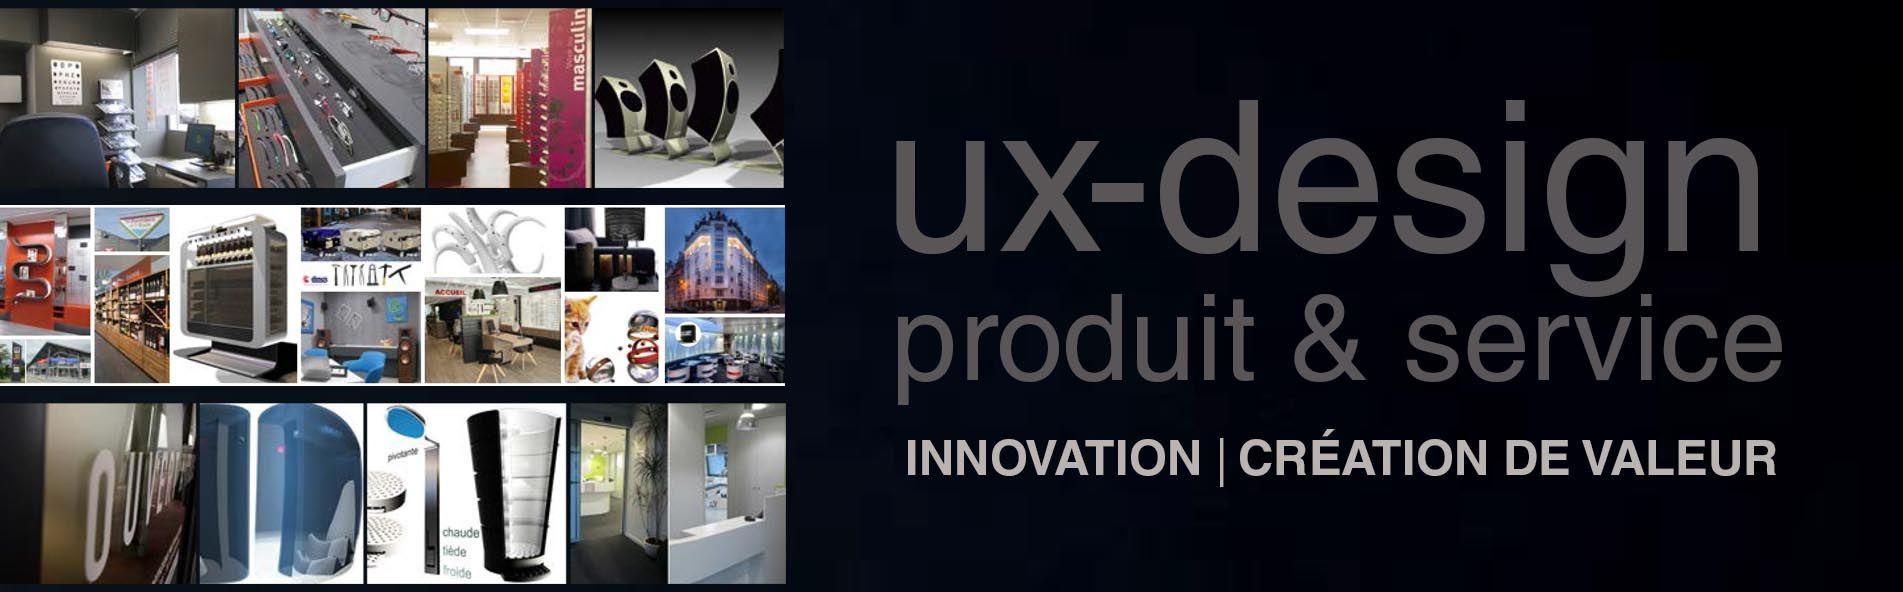 Nayla Pallard UX Design - Produit et Service - Innovation - Creation De Valeur